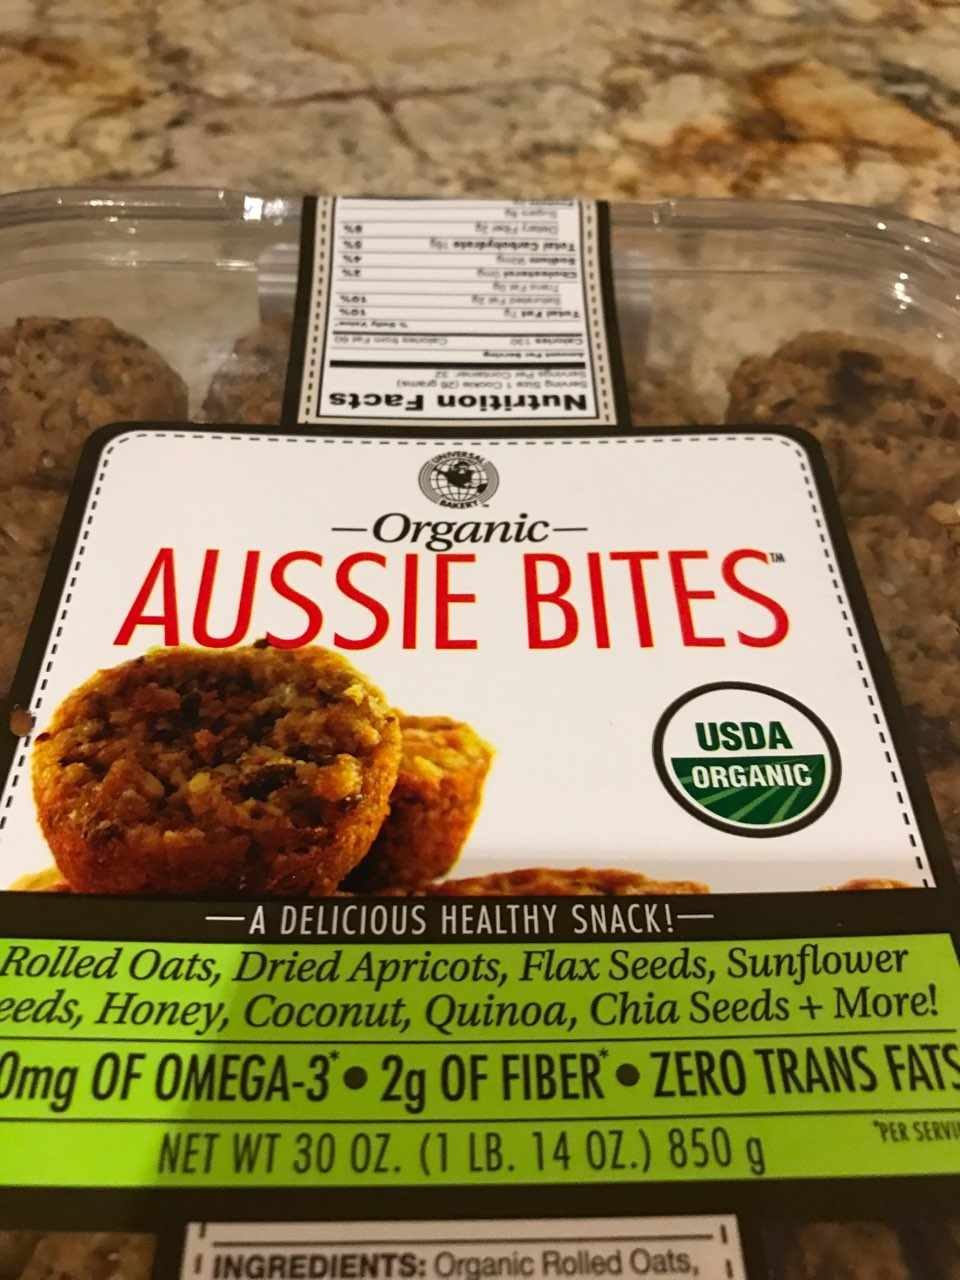 Aussie Bites Calories : aussie, bites, calories, Universal, Bakery, Aussie, Bites,, Organic:, Calories,, Nutrition, Analysis, Fooducate